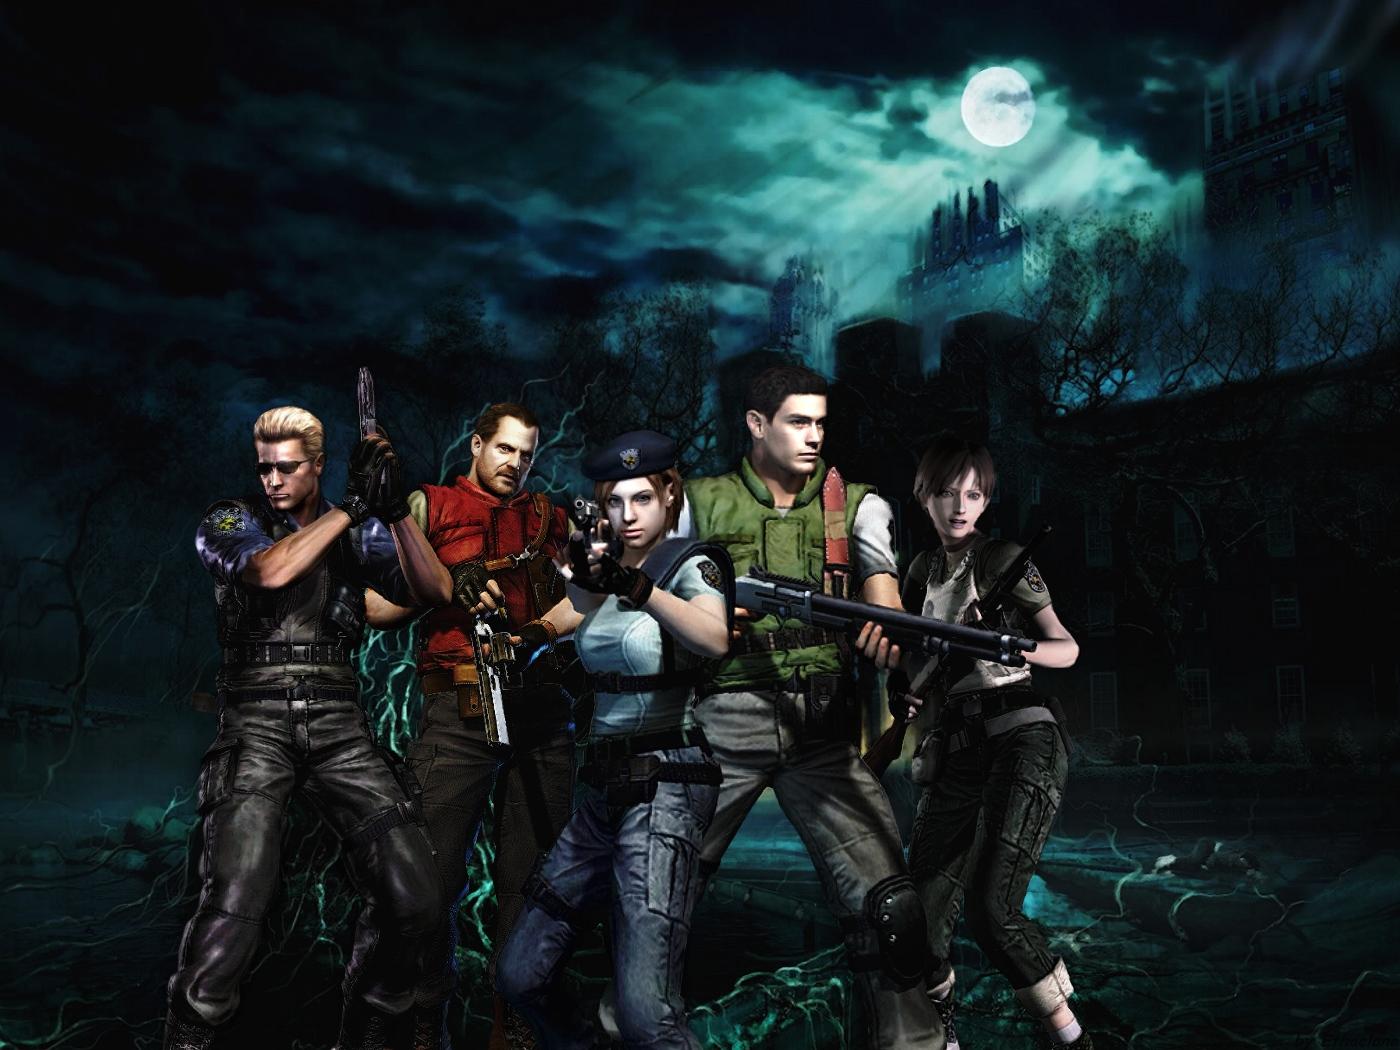 48 Resident Evil 2 Wallpapers On Wallpapersafari